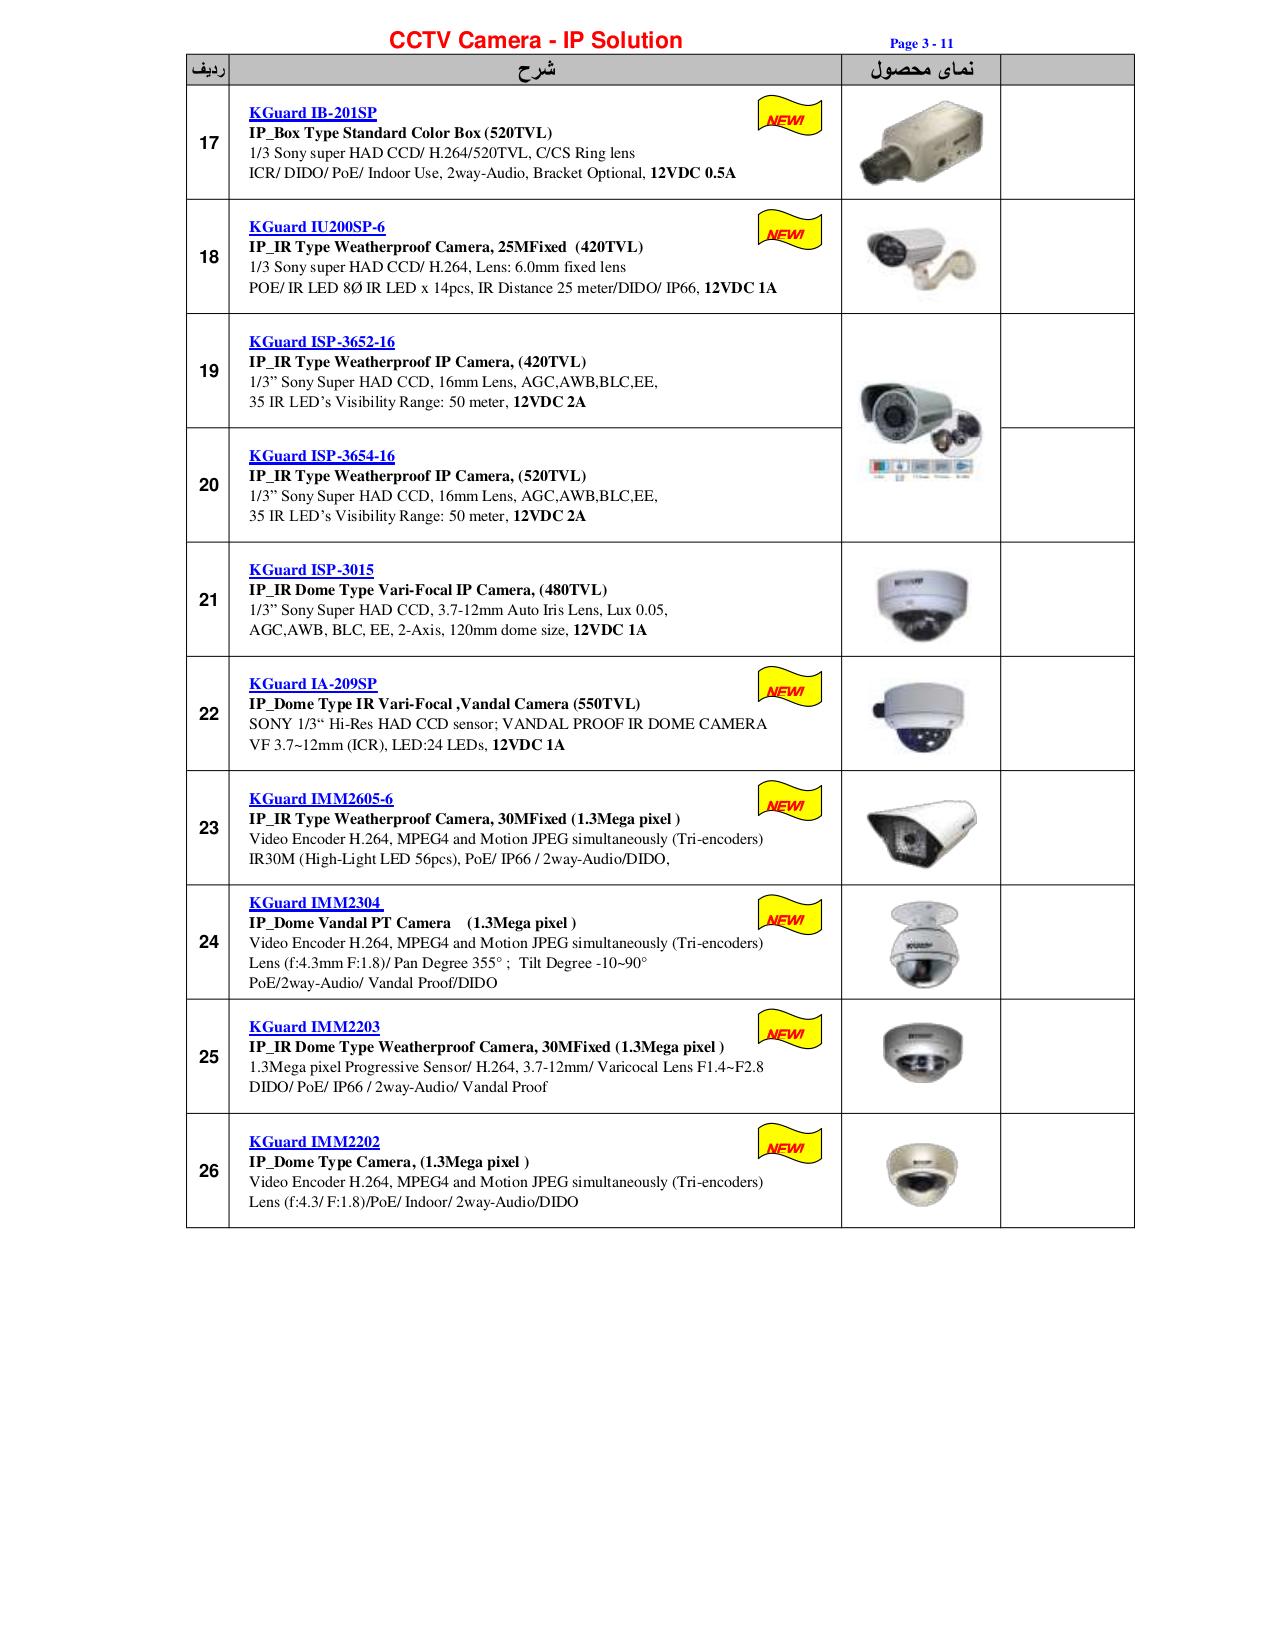 Kguard Security Camera CSN-3262-3B pdf page preview